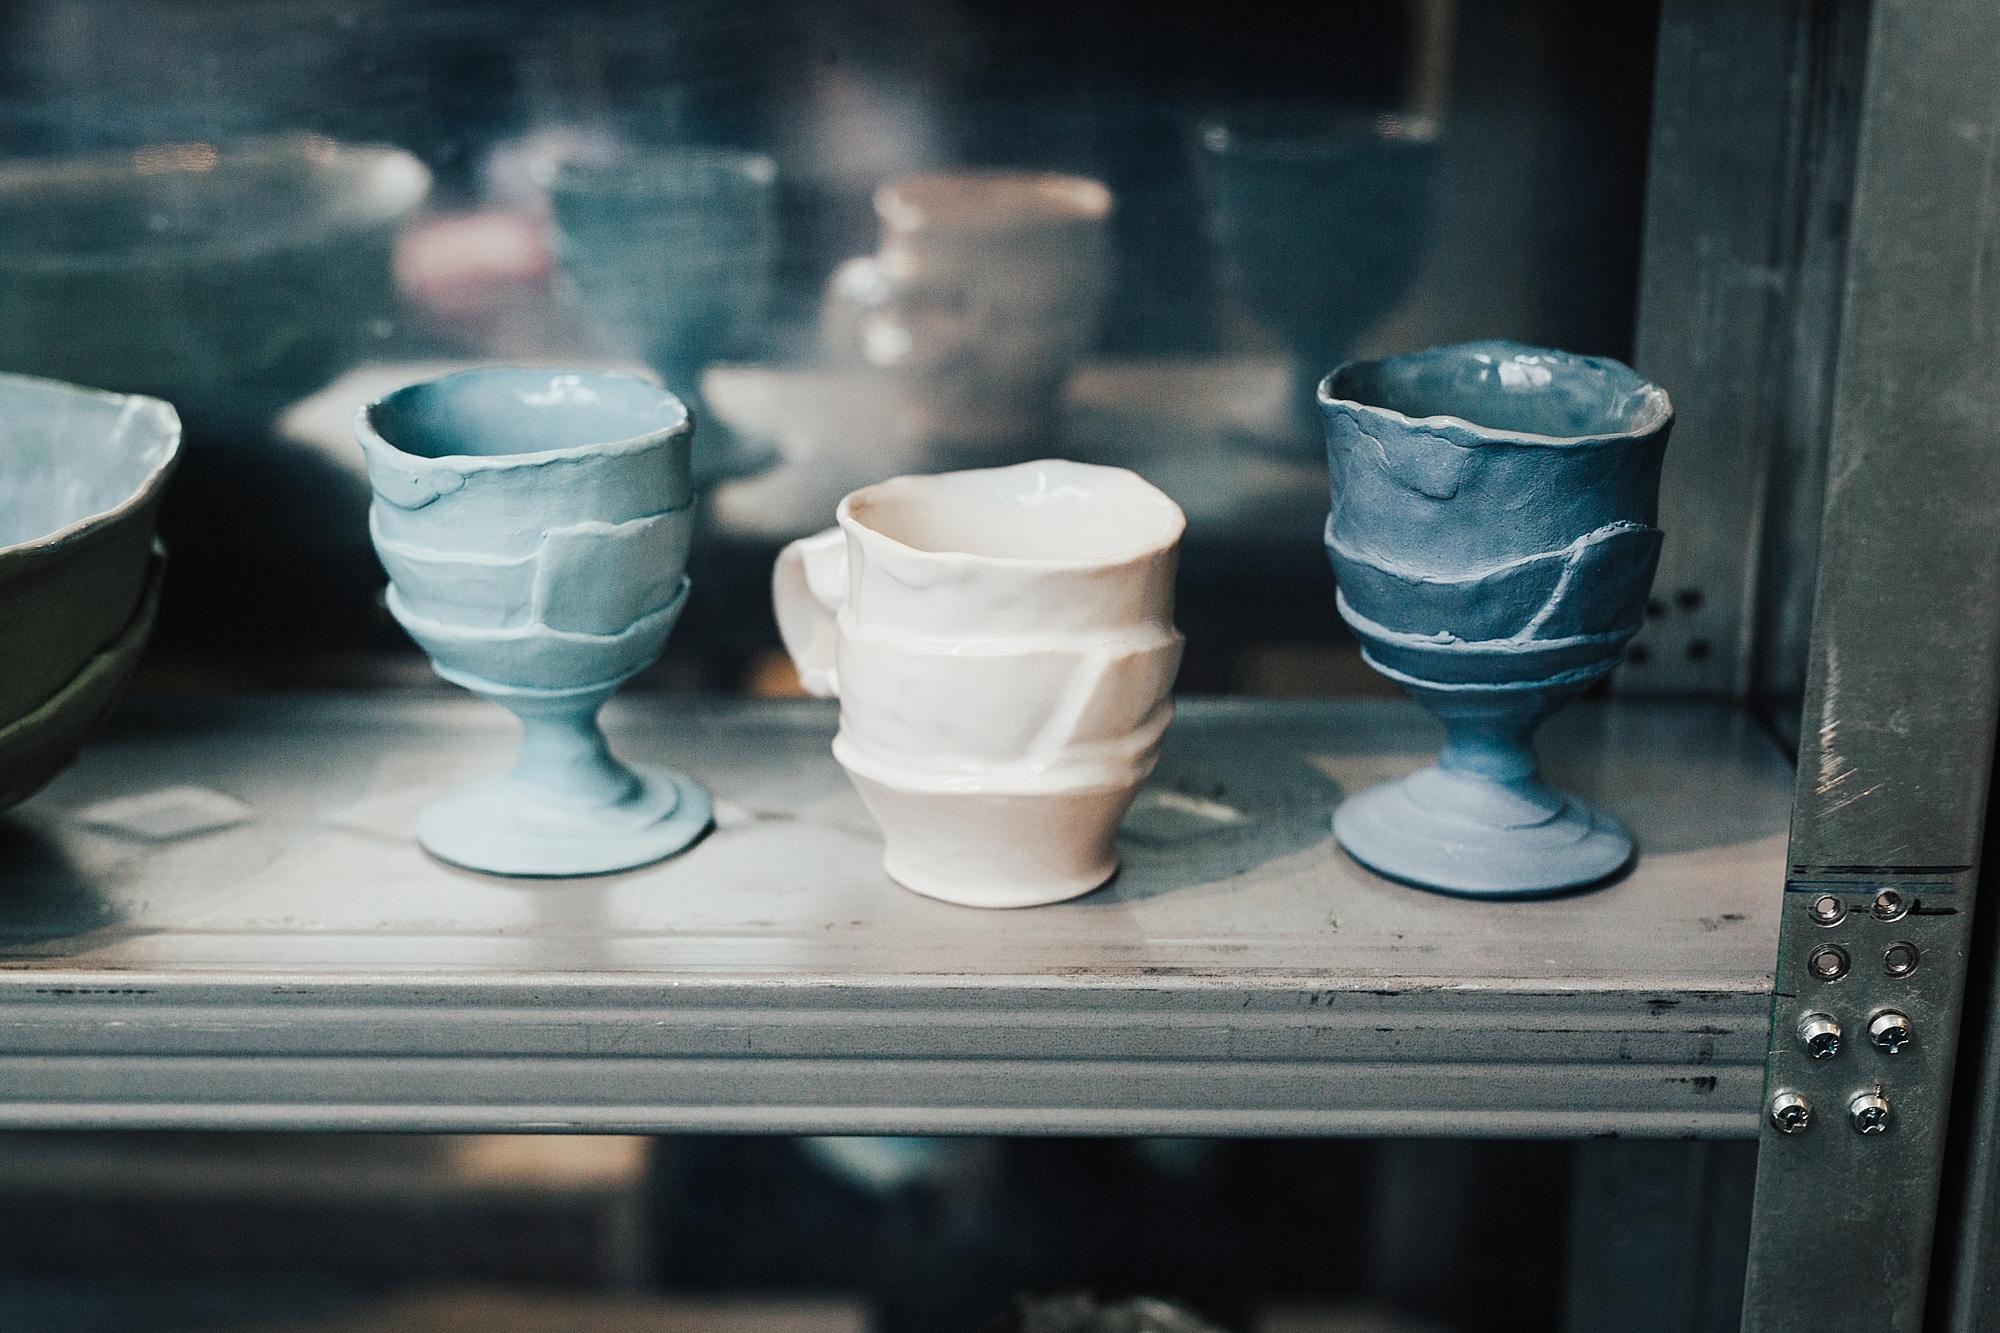 Joe_Mac_Creative_Photography_pittsburgh_NCECA_National_Council_On_Education_For_The_Ceramic_Arts15.JPG